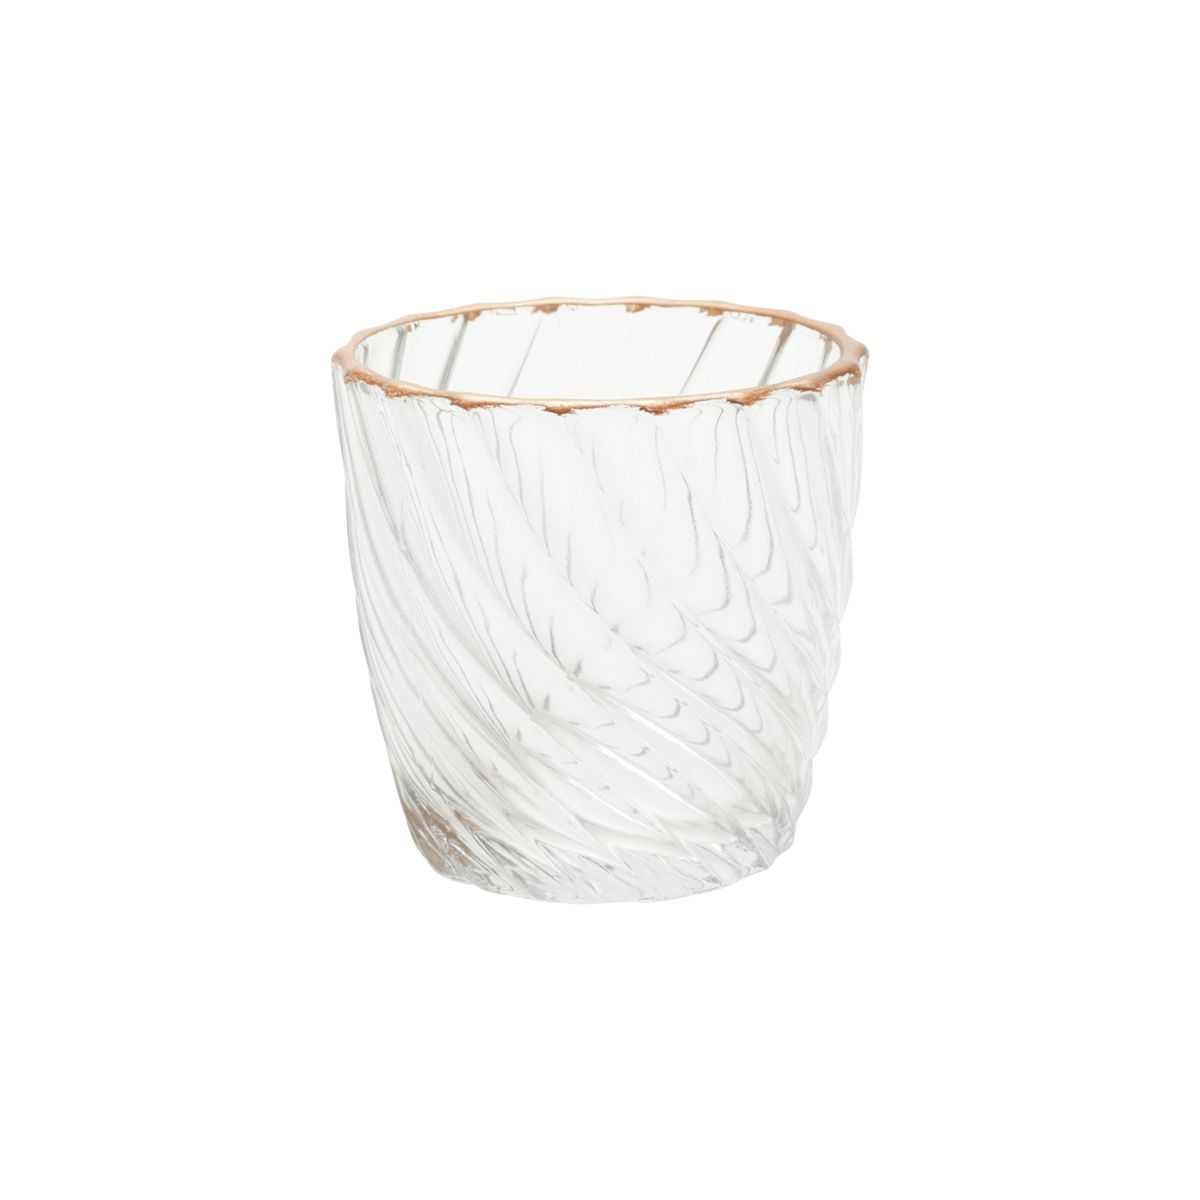 Castiçal de Vidro Colar Waves 7,2 cm x 7,2 cm x 7,5 cm